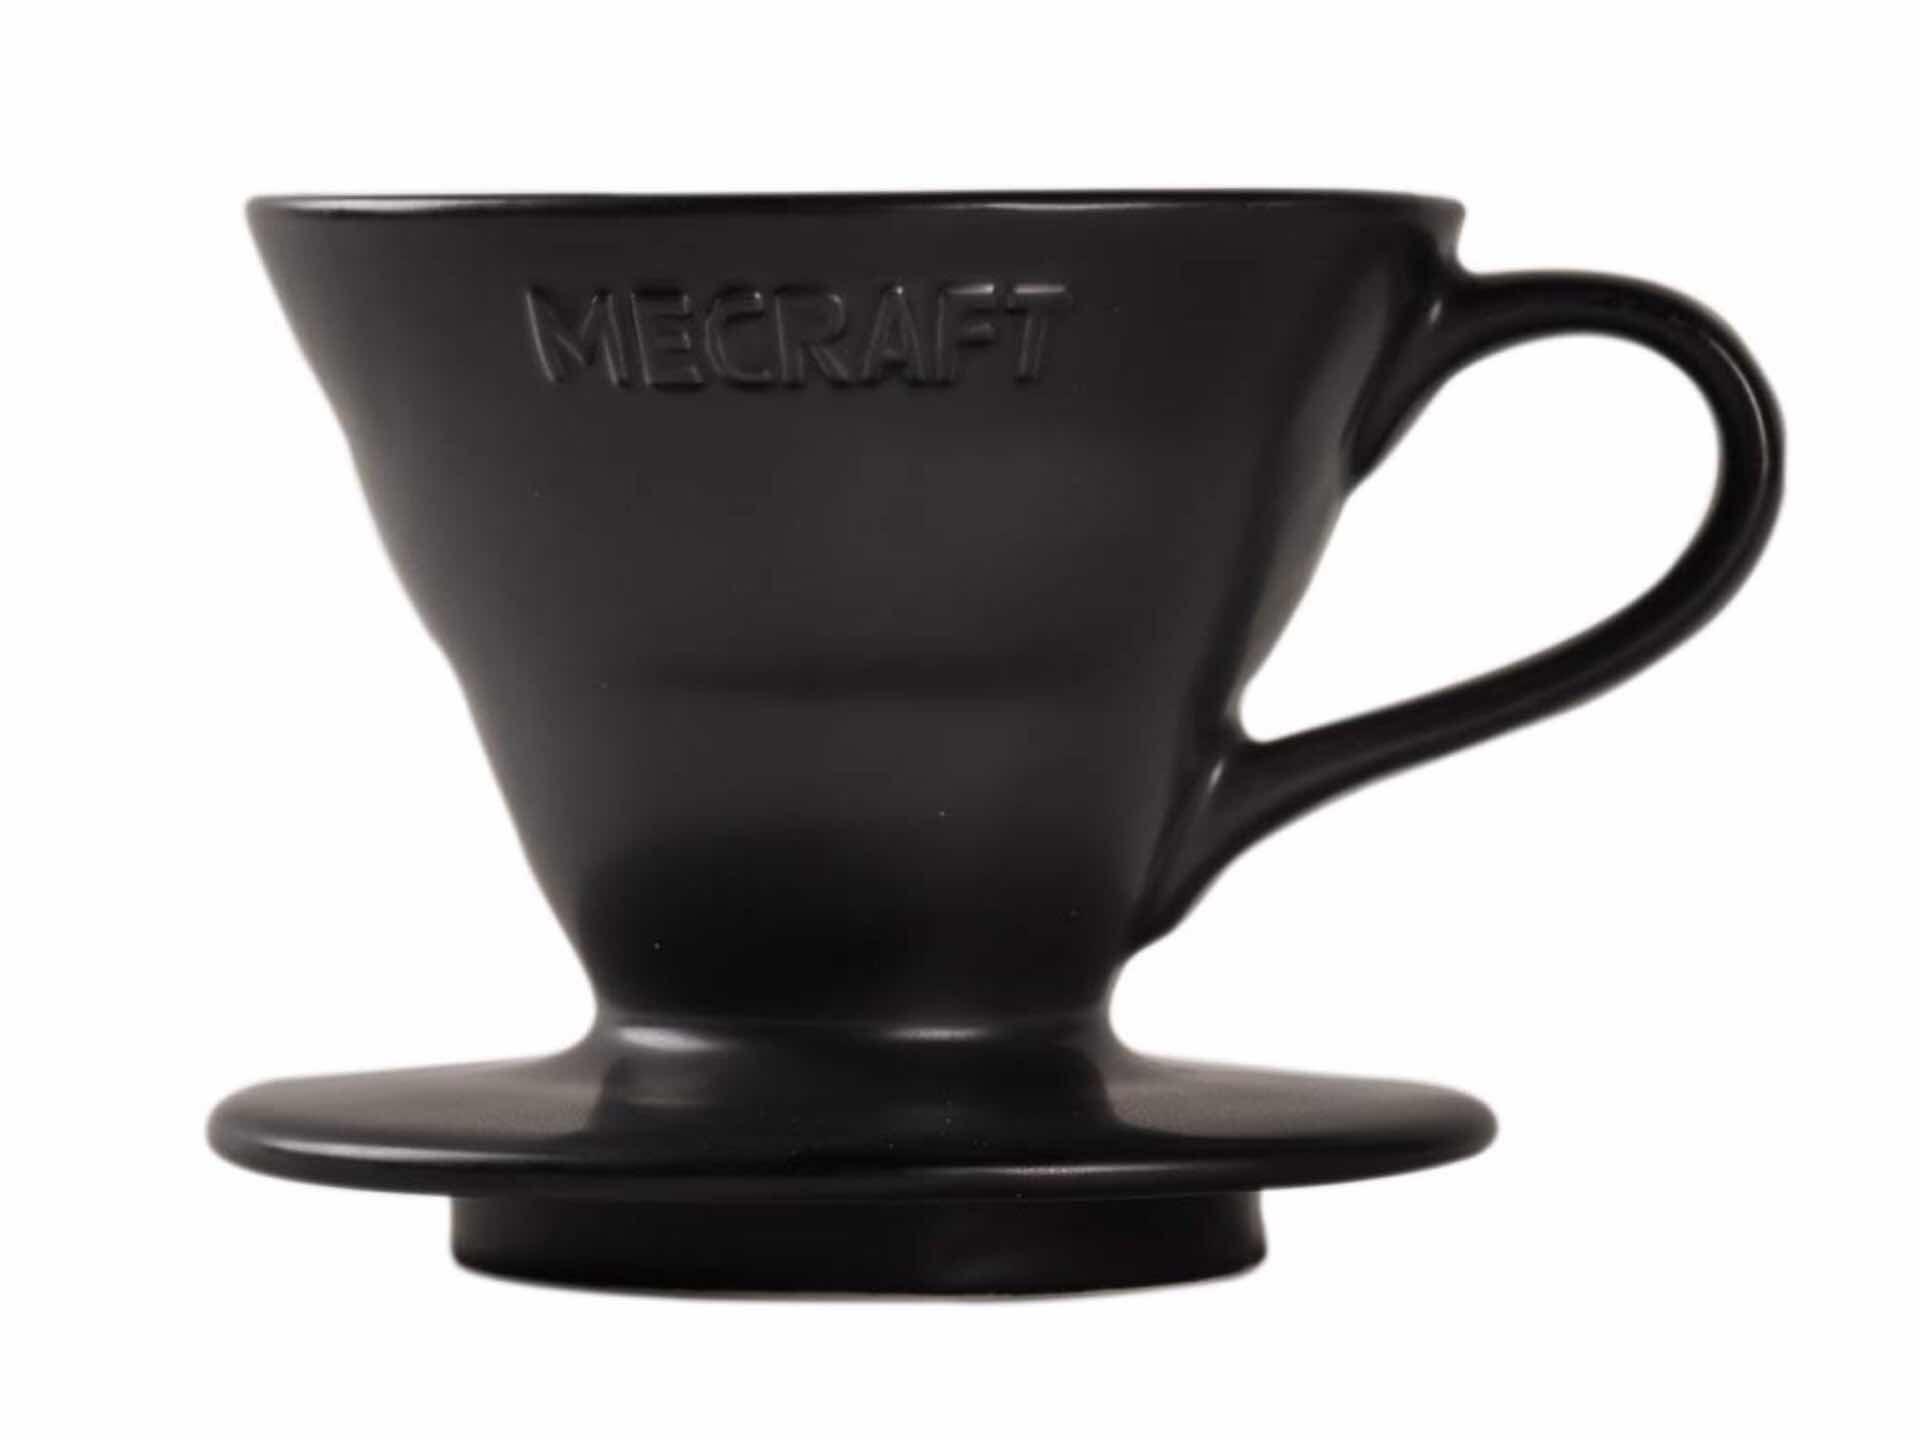 Mecraft ceramic pour-over dripper in matte black. ($13)